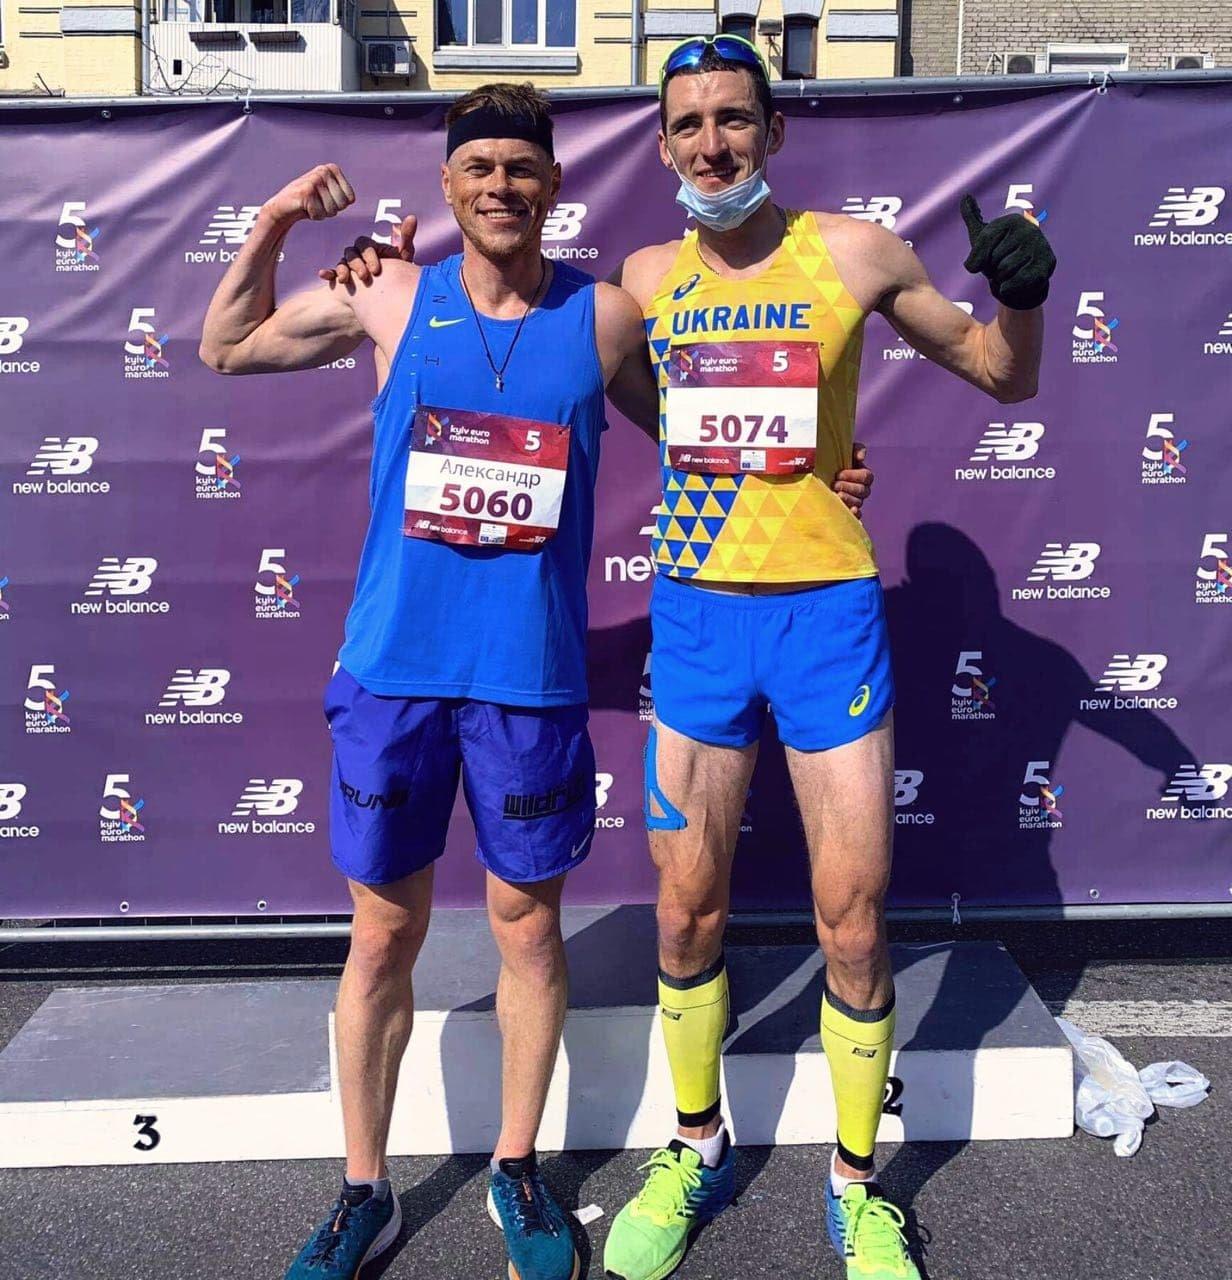 Мариуполец занял 3-е место в Международном престижном марафоне, фото-2